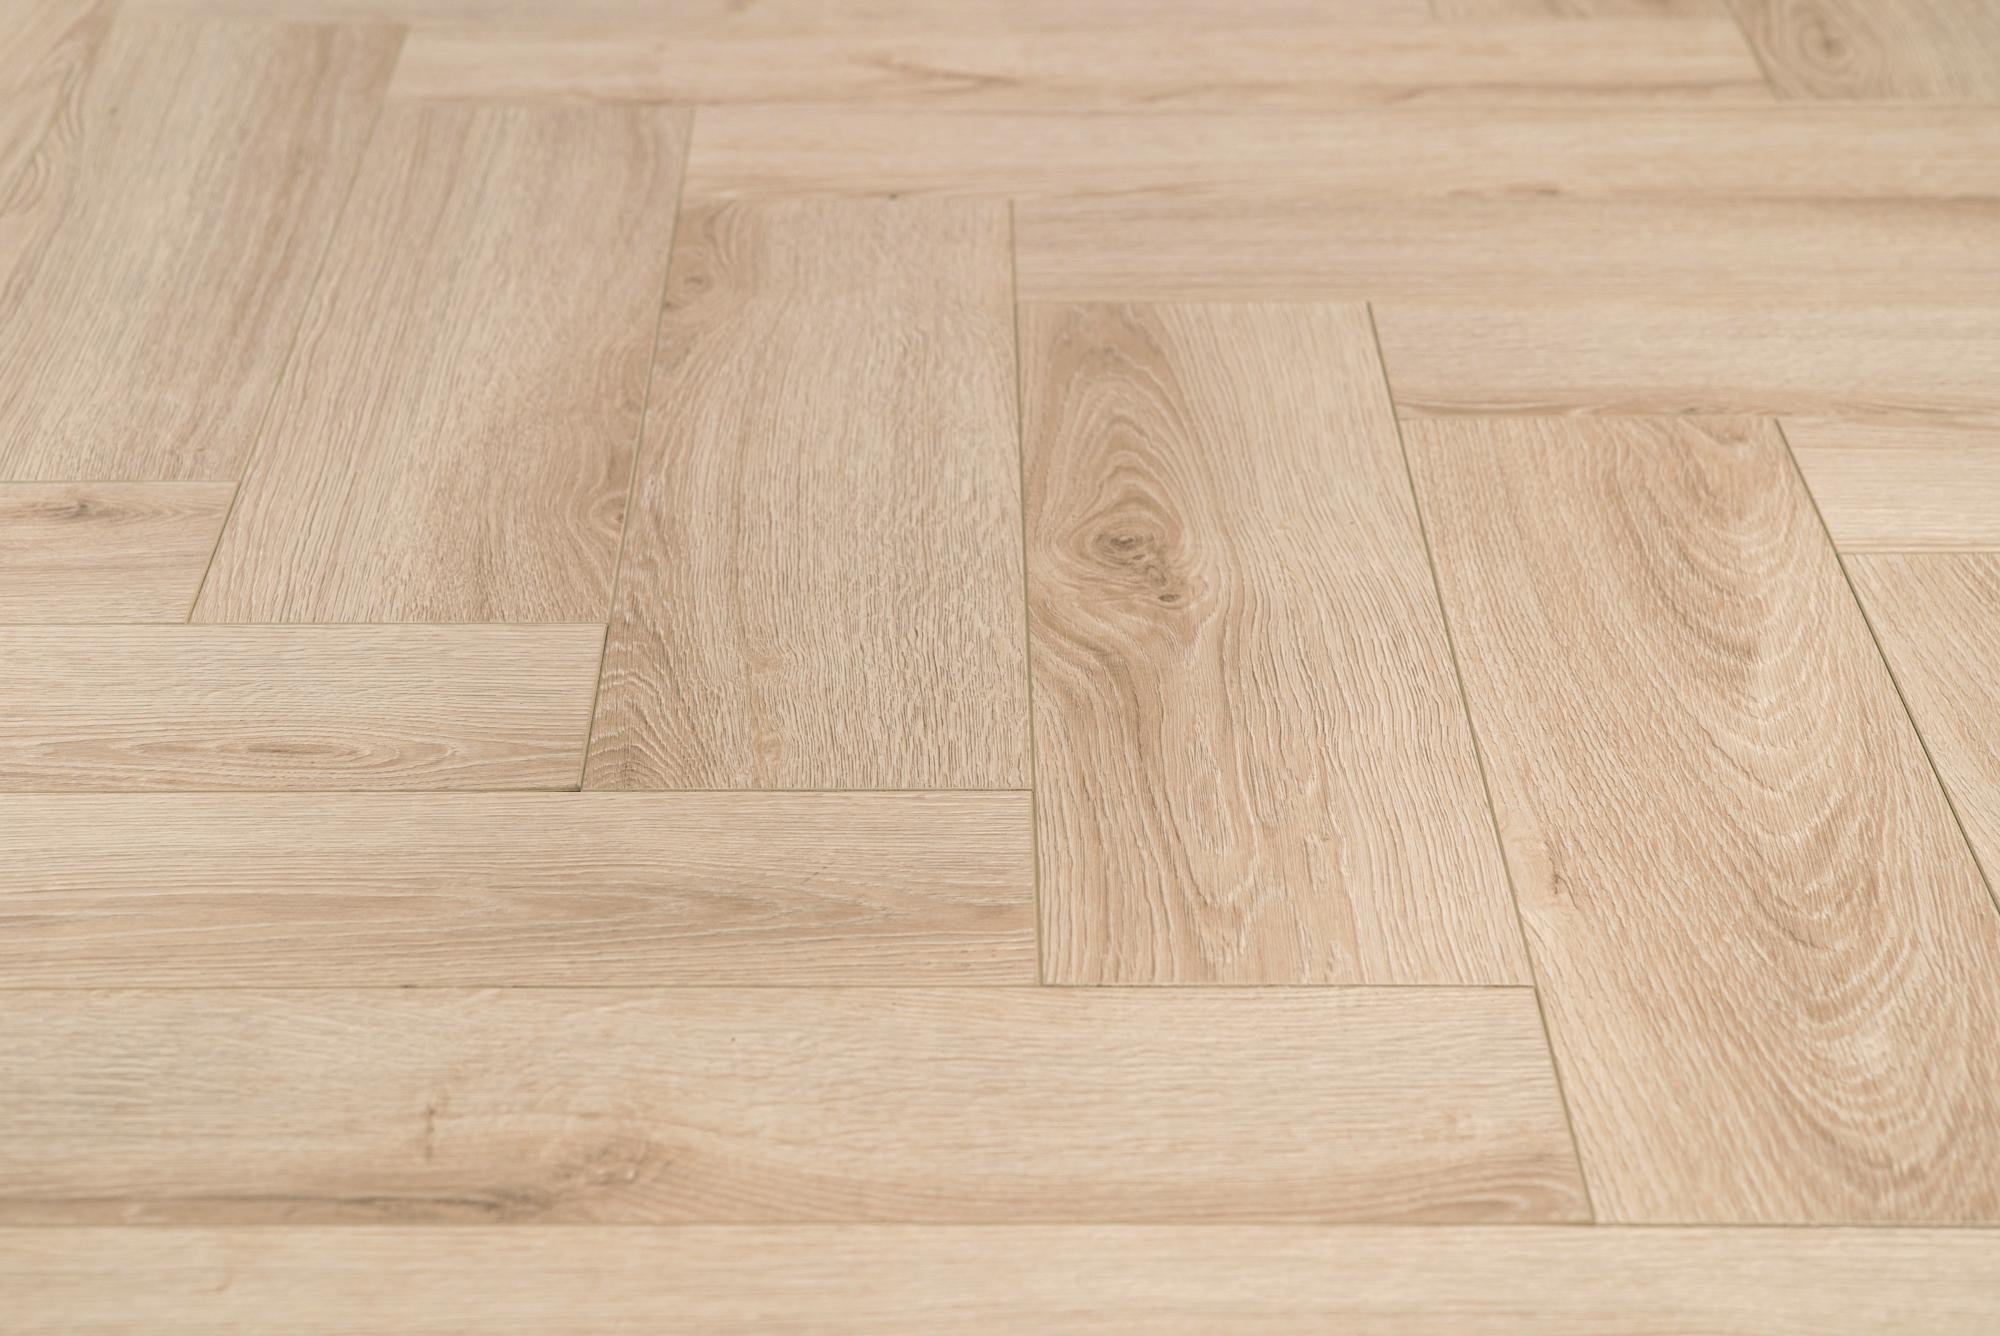 Floer visgraat laminaat vloeren crème eiken patroon vloer